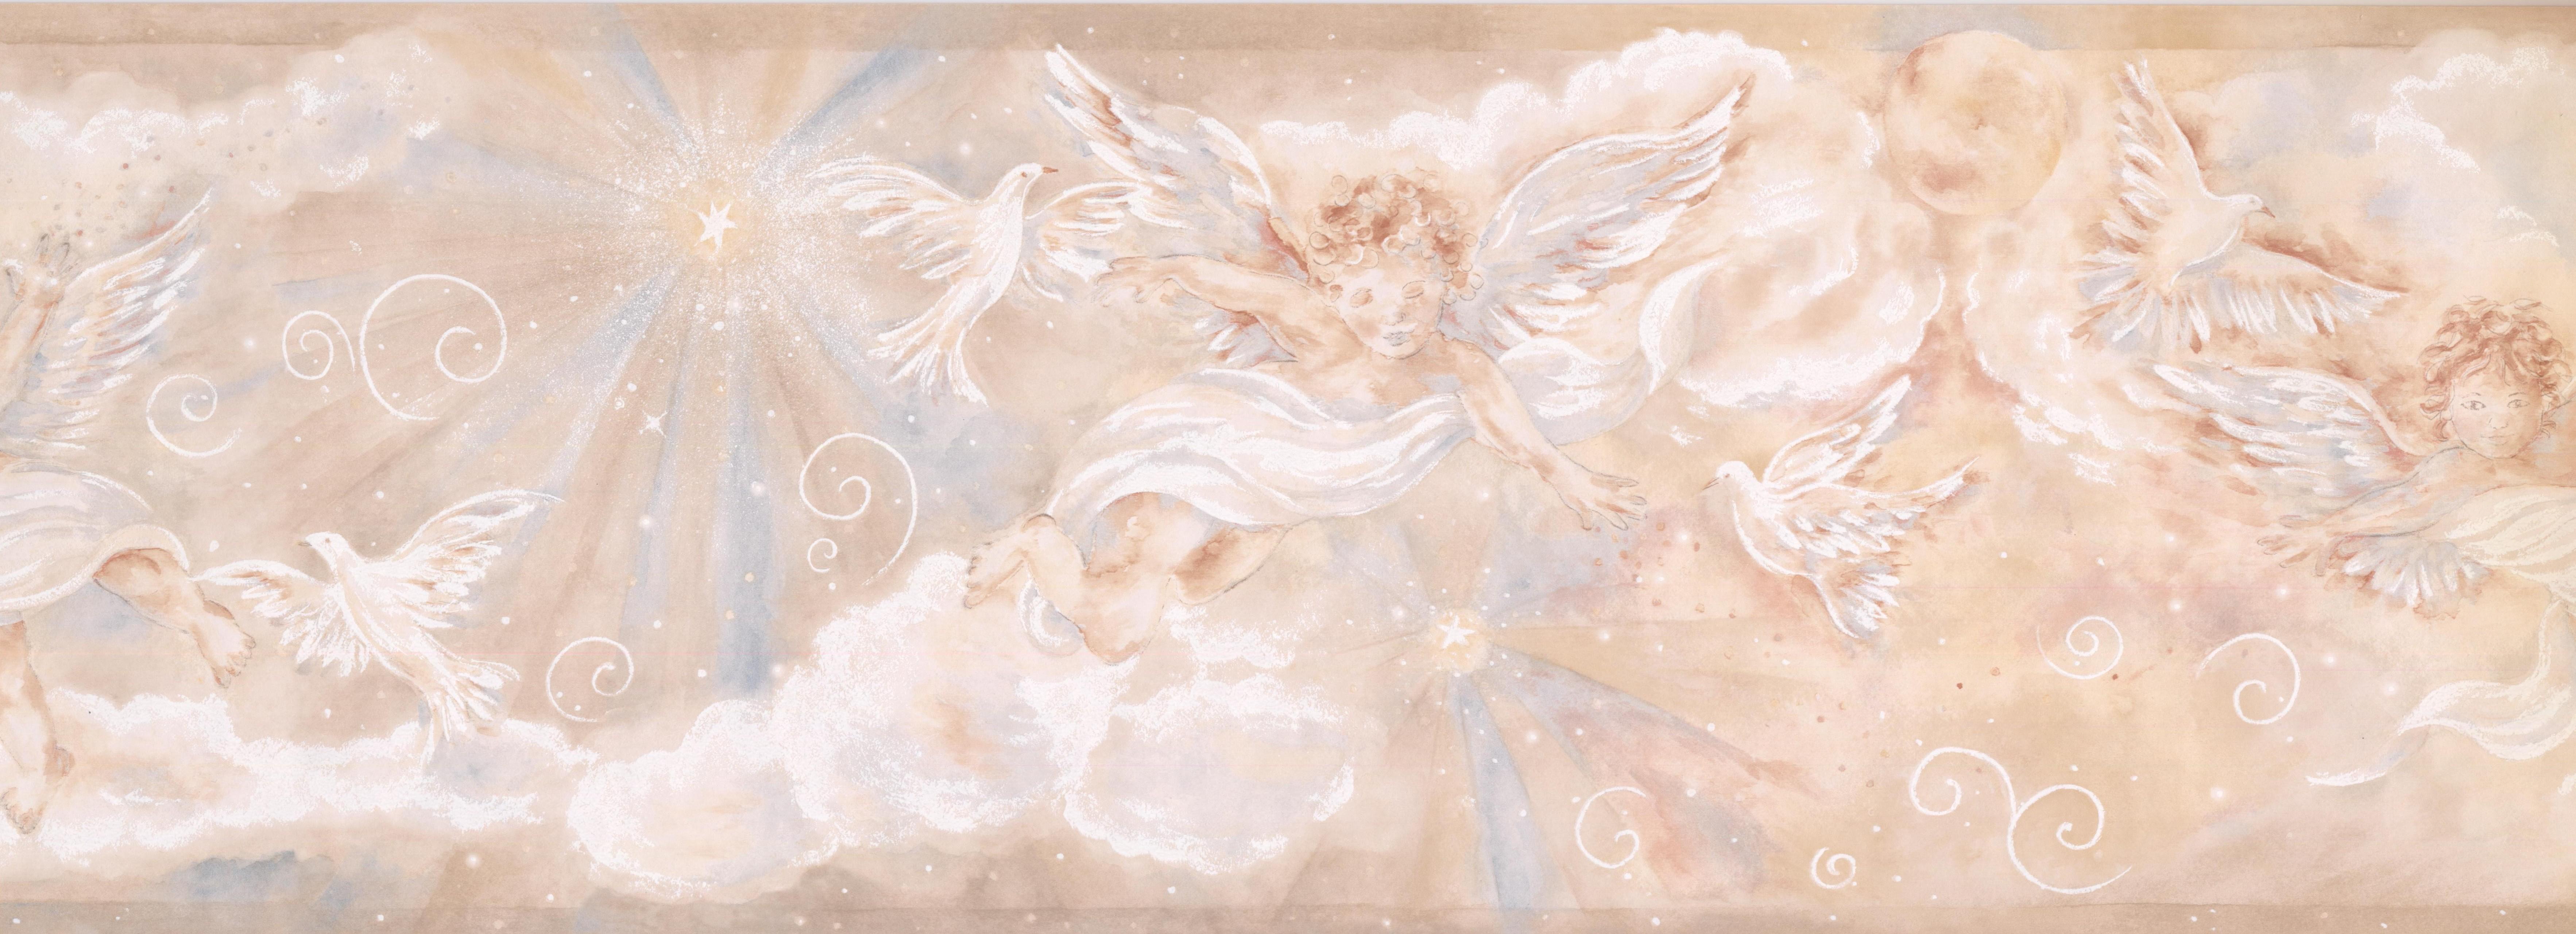 Chesapeake Cupid Dove Clouds Wallpaper Border 15 X 8 5 Beige Lowe S Canada